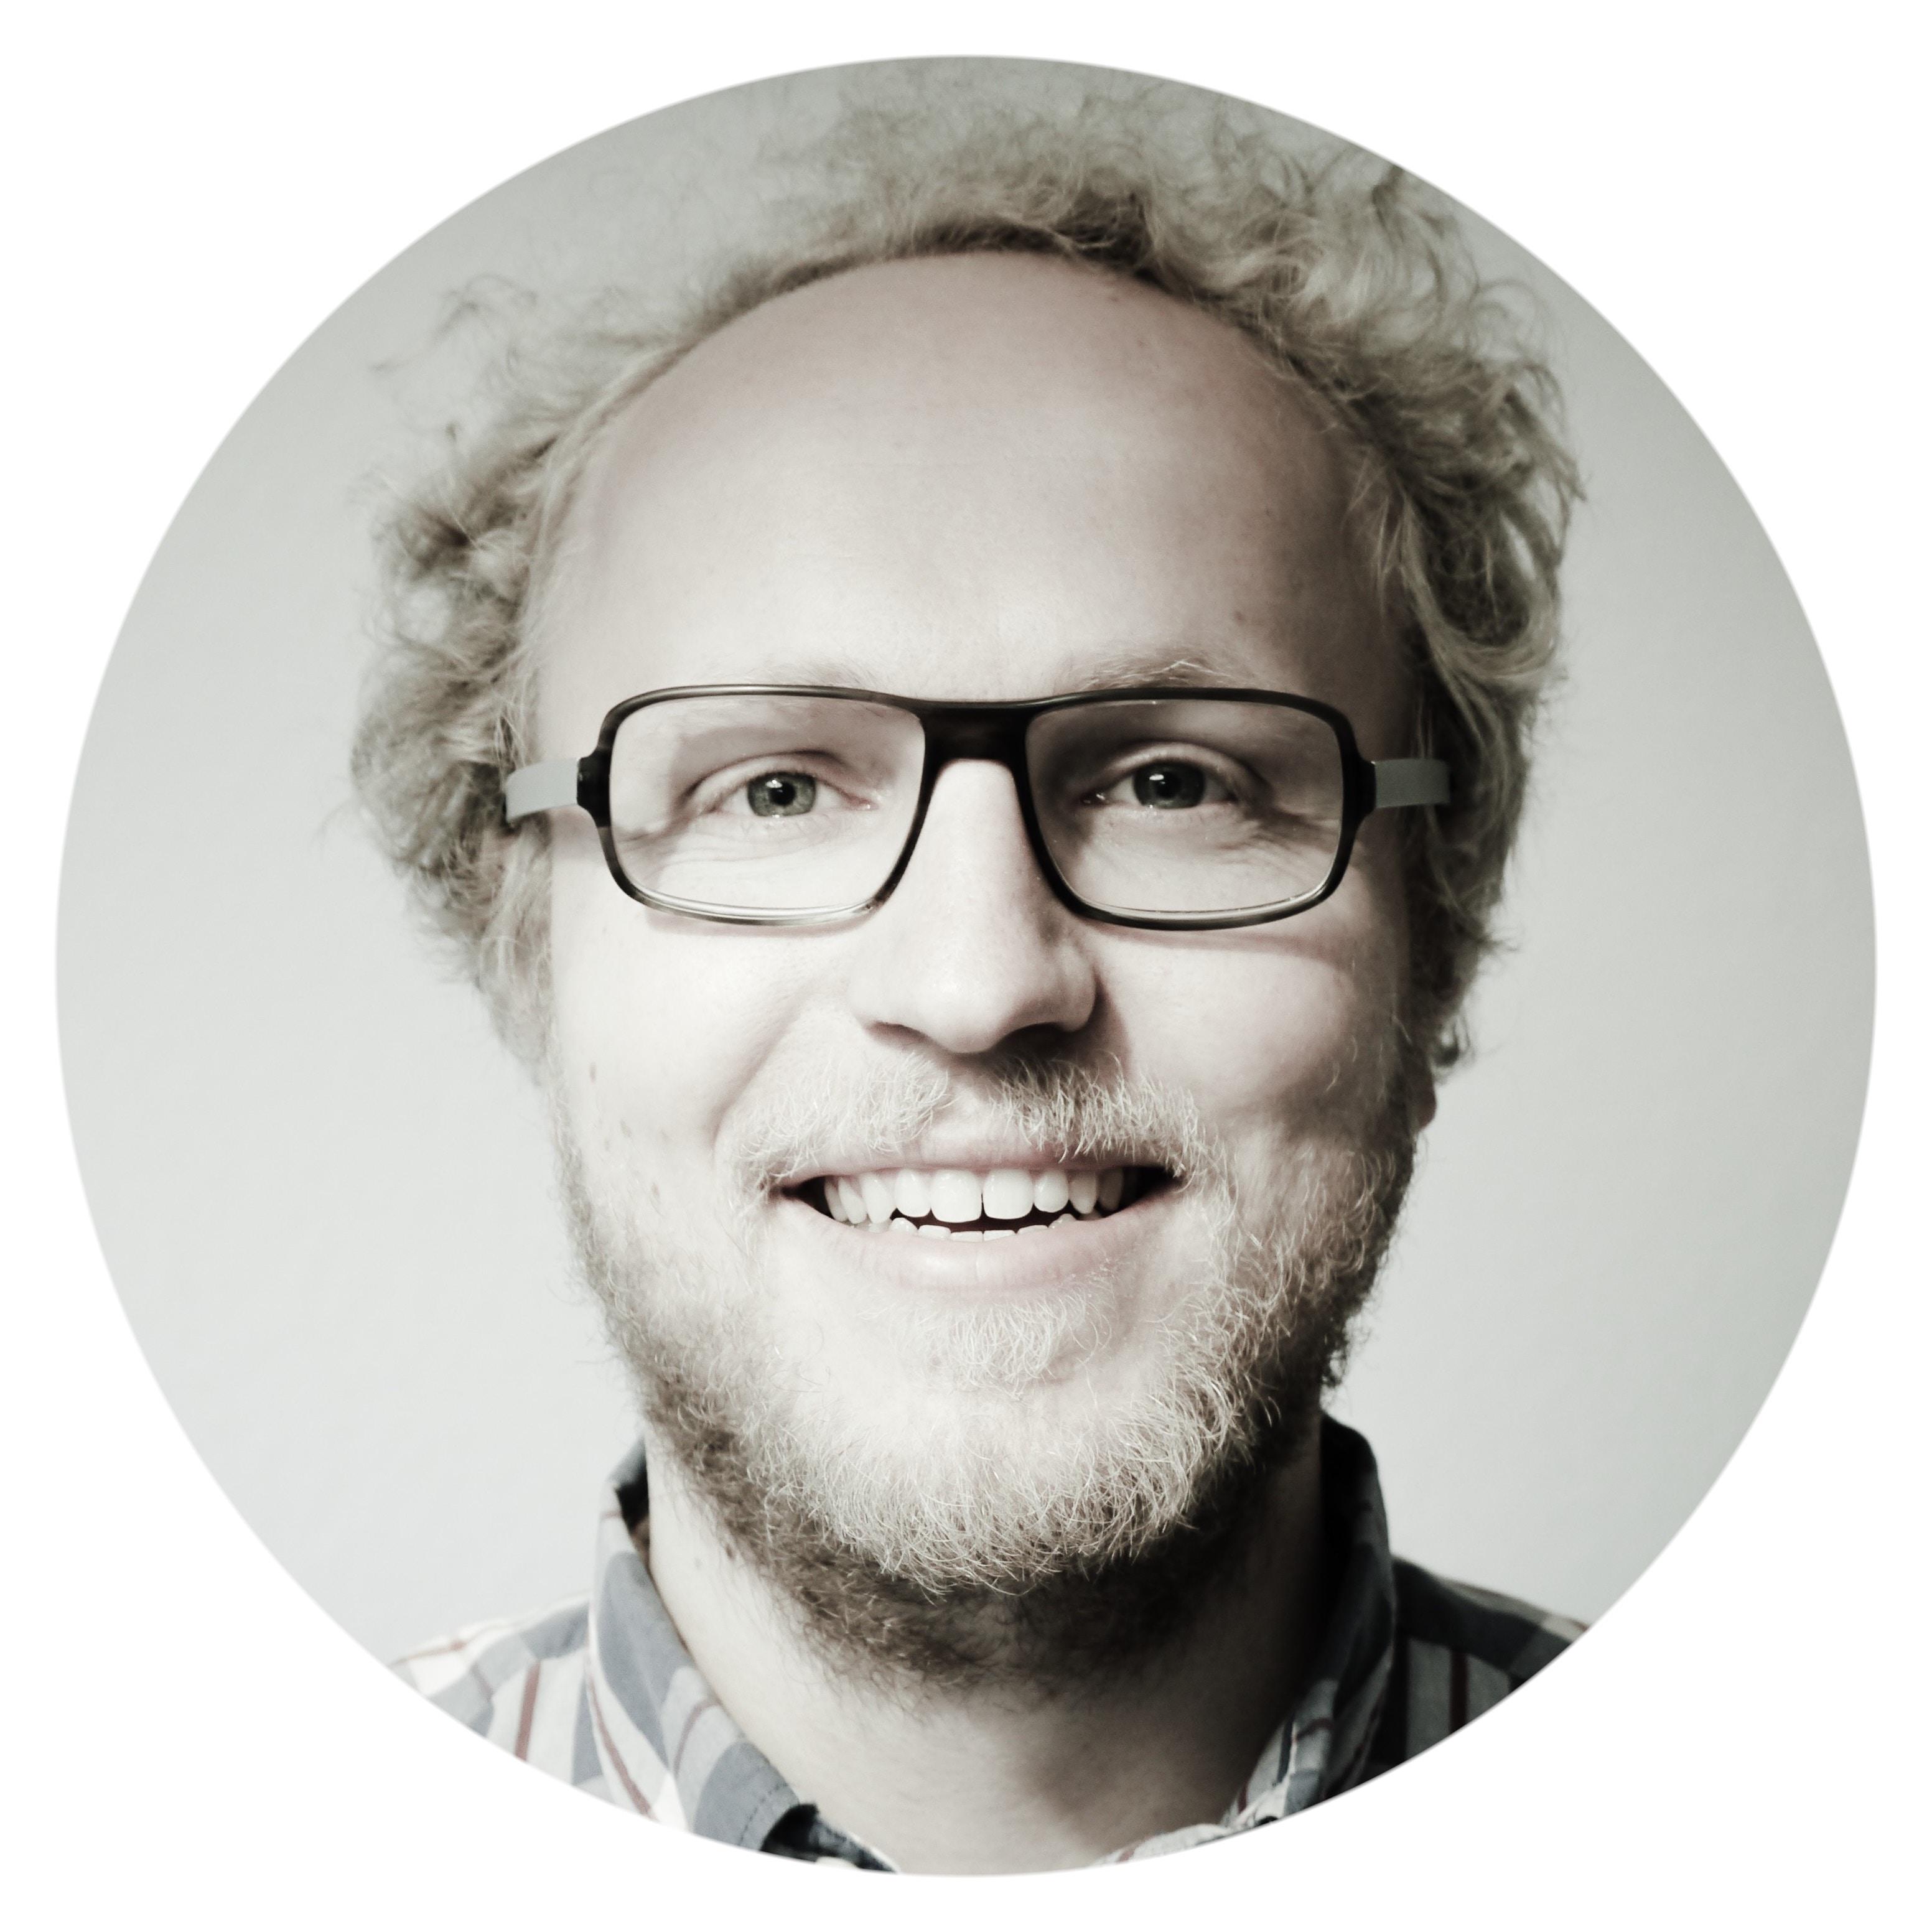 Go to Johannes Schaefers's profile